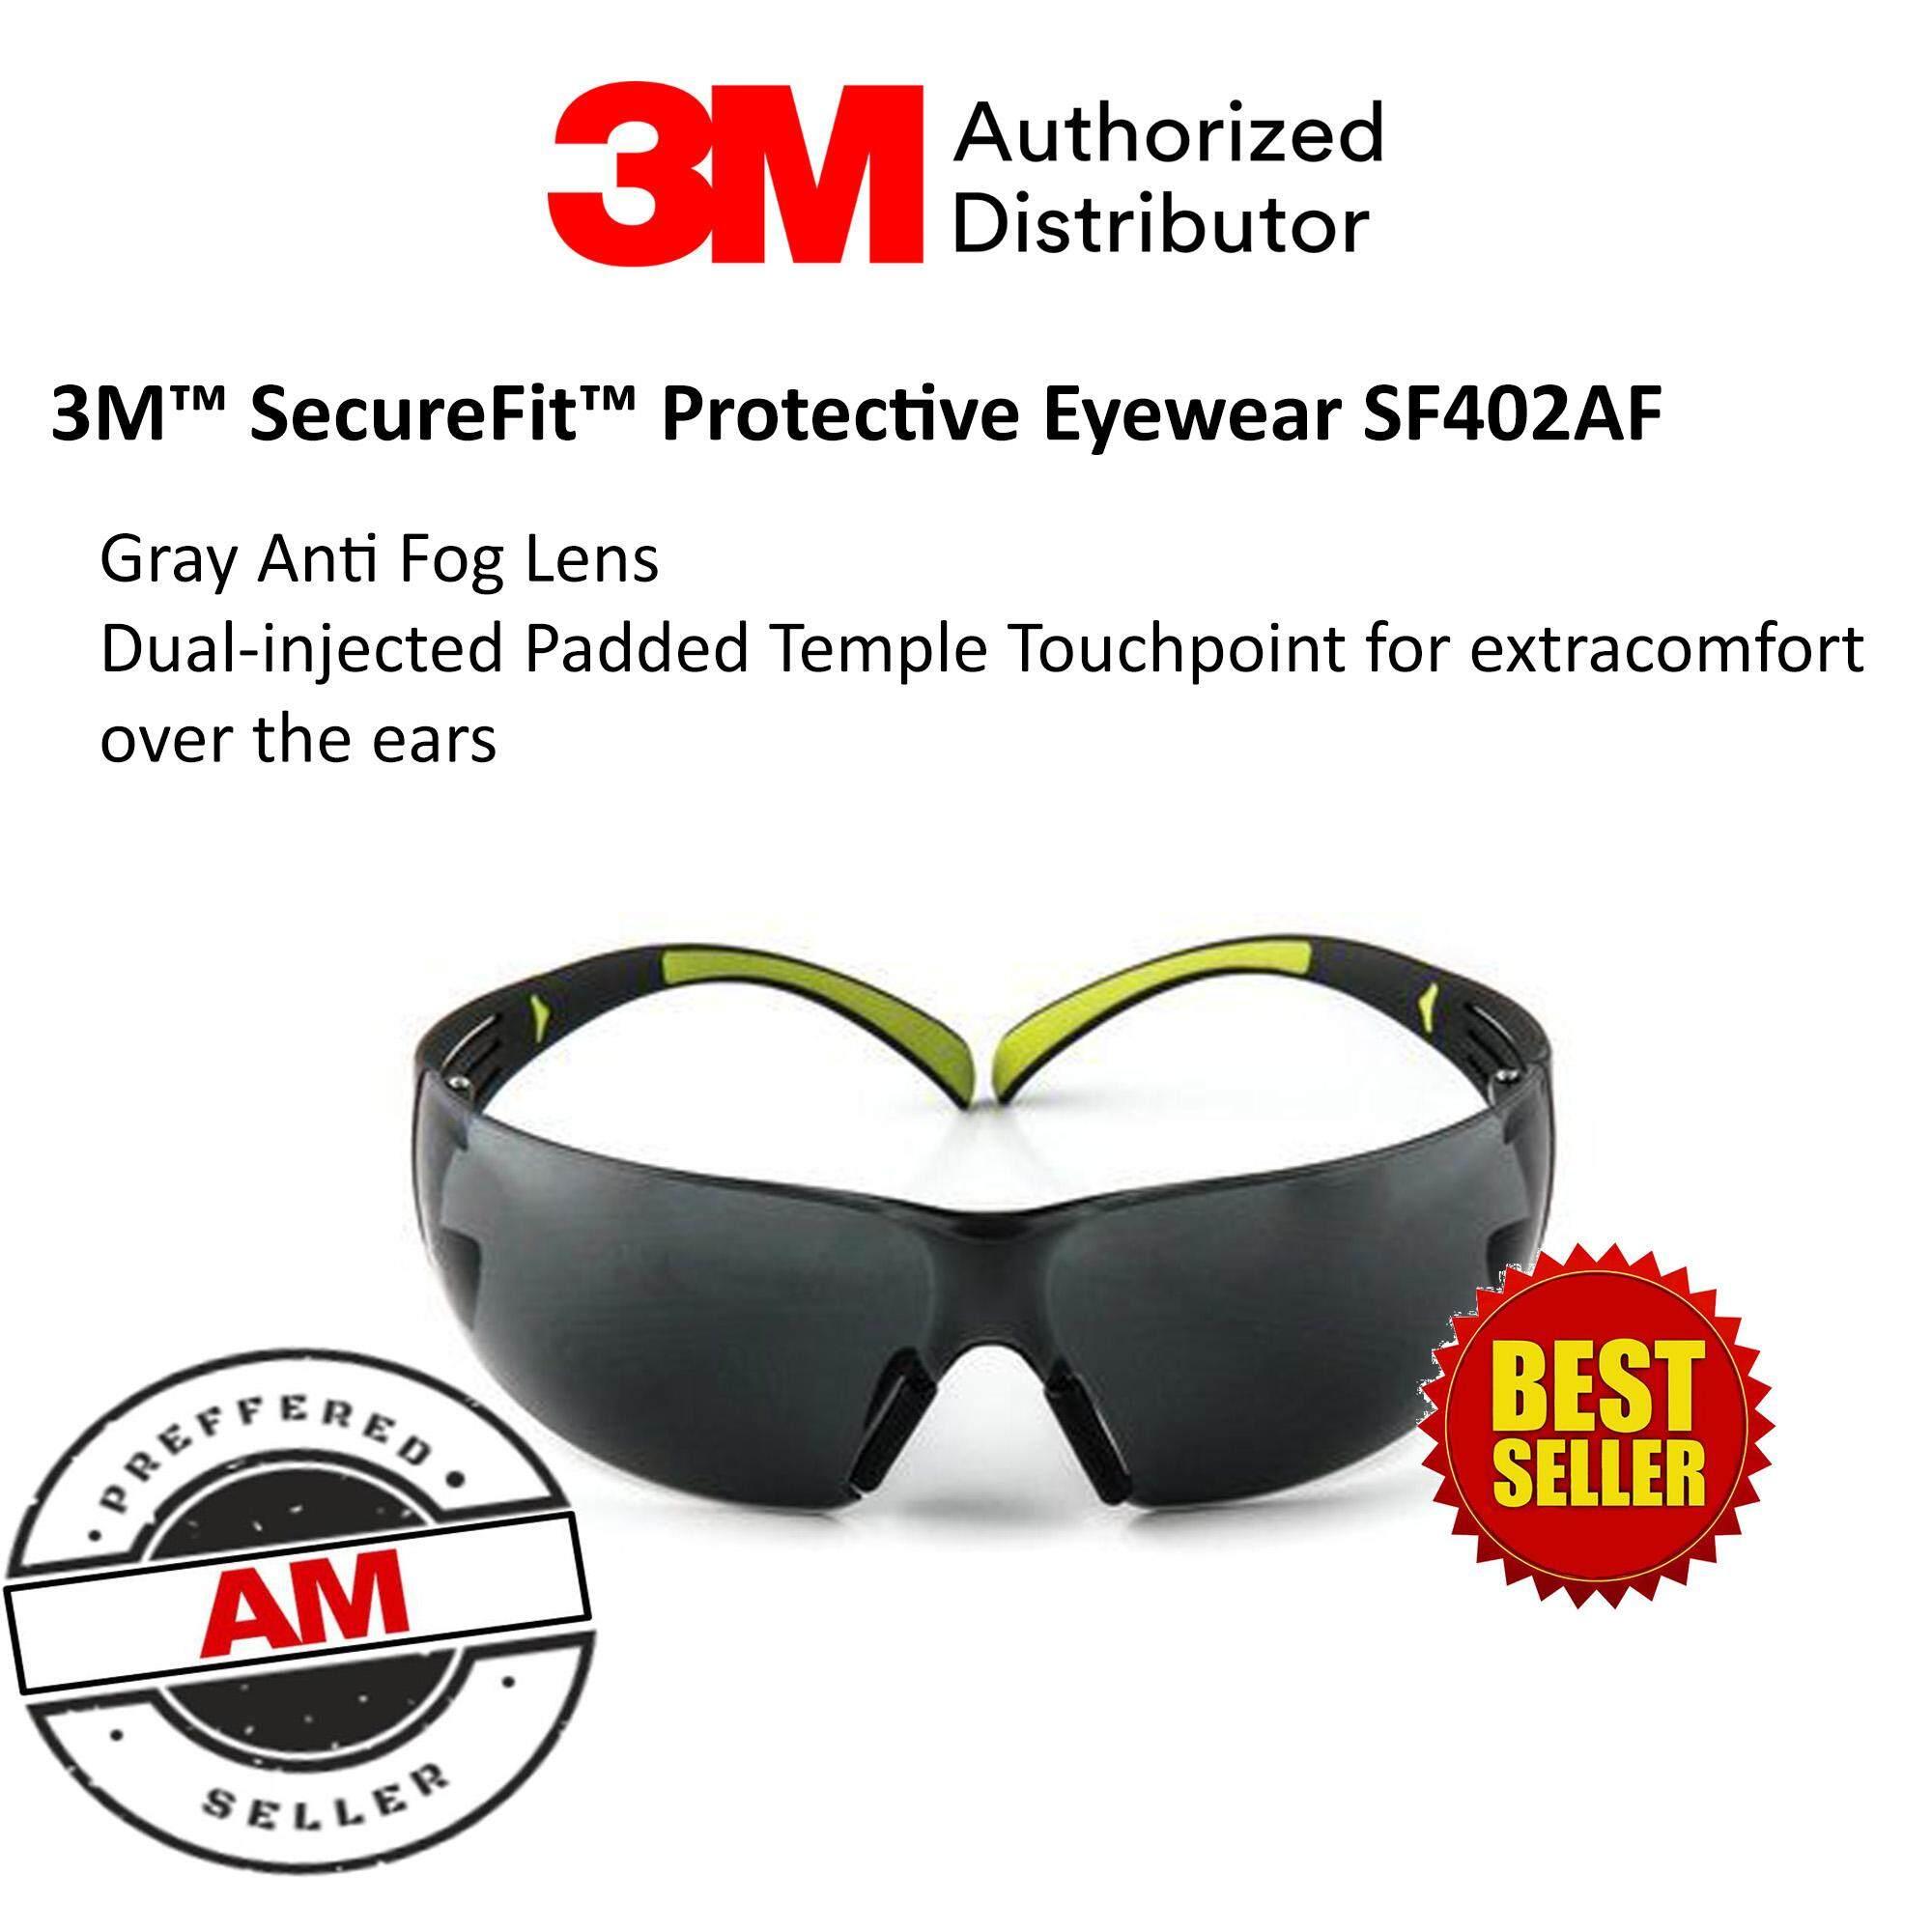 3M™ SecureFit™ Protective Eyewear SF402AF, Grey Anti-fog Lens